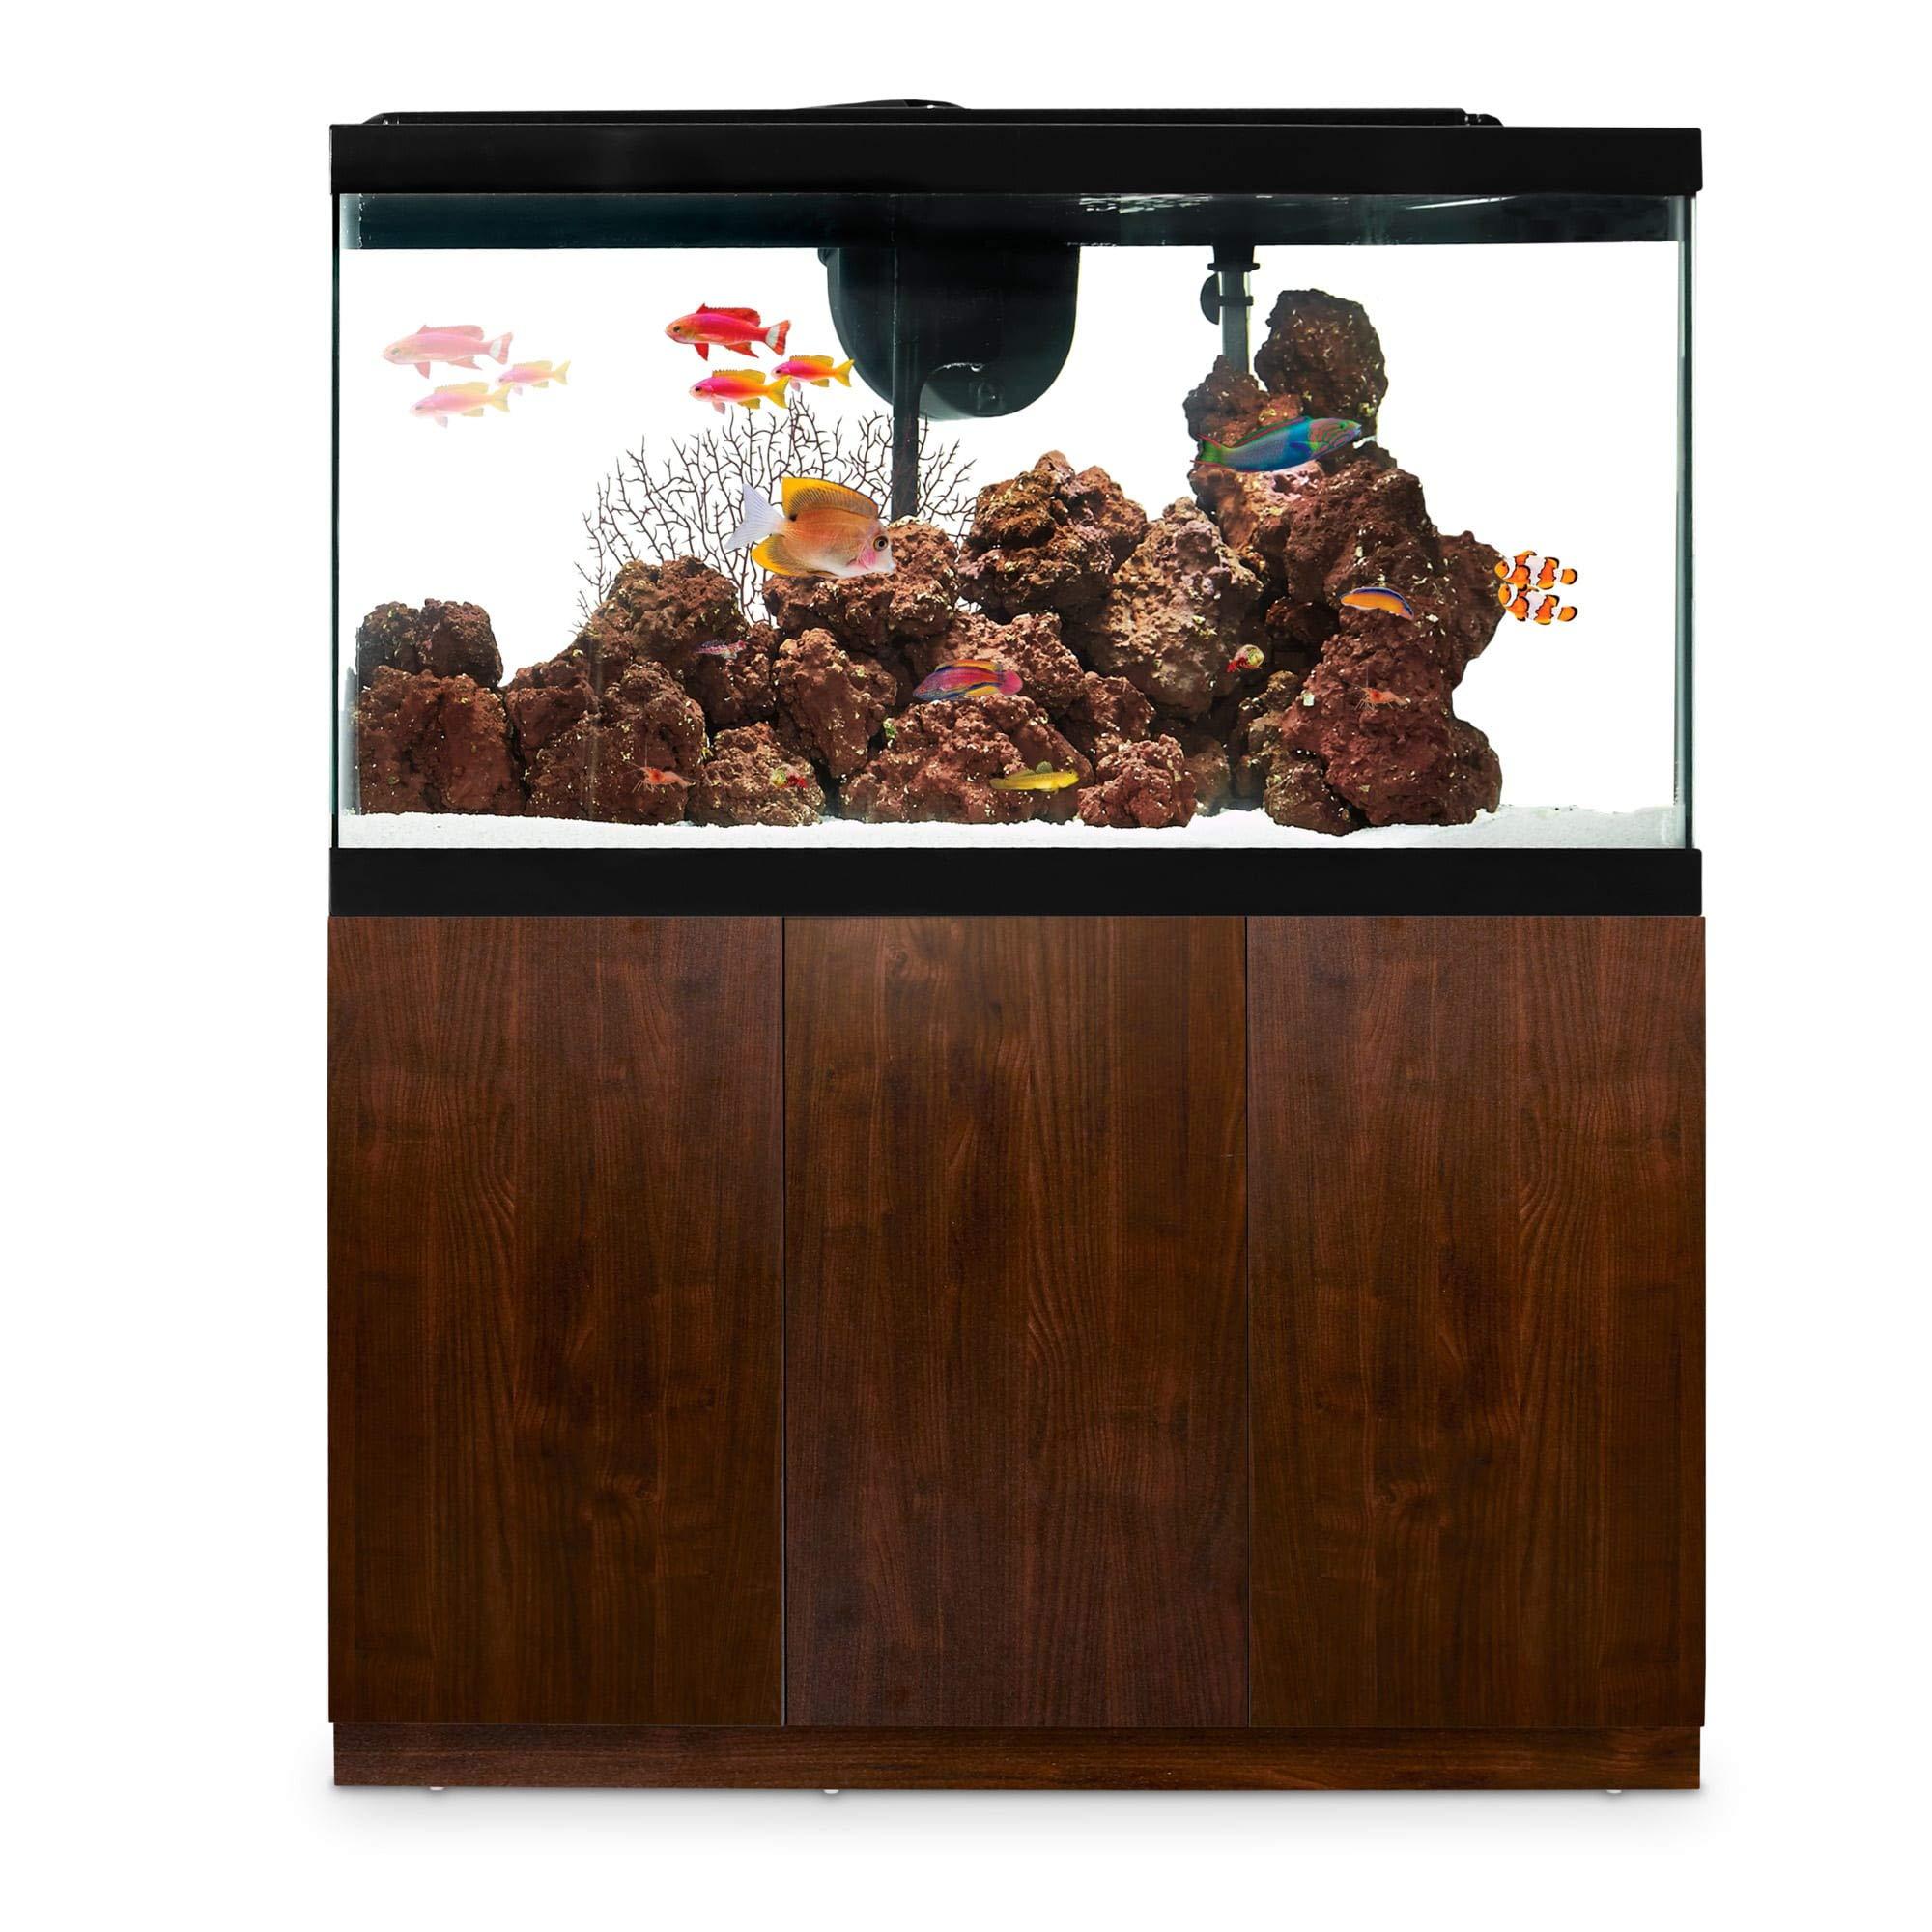 Imagitarium Faux Woodgrain Fish Tank Stand, Up to 55 Gal.